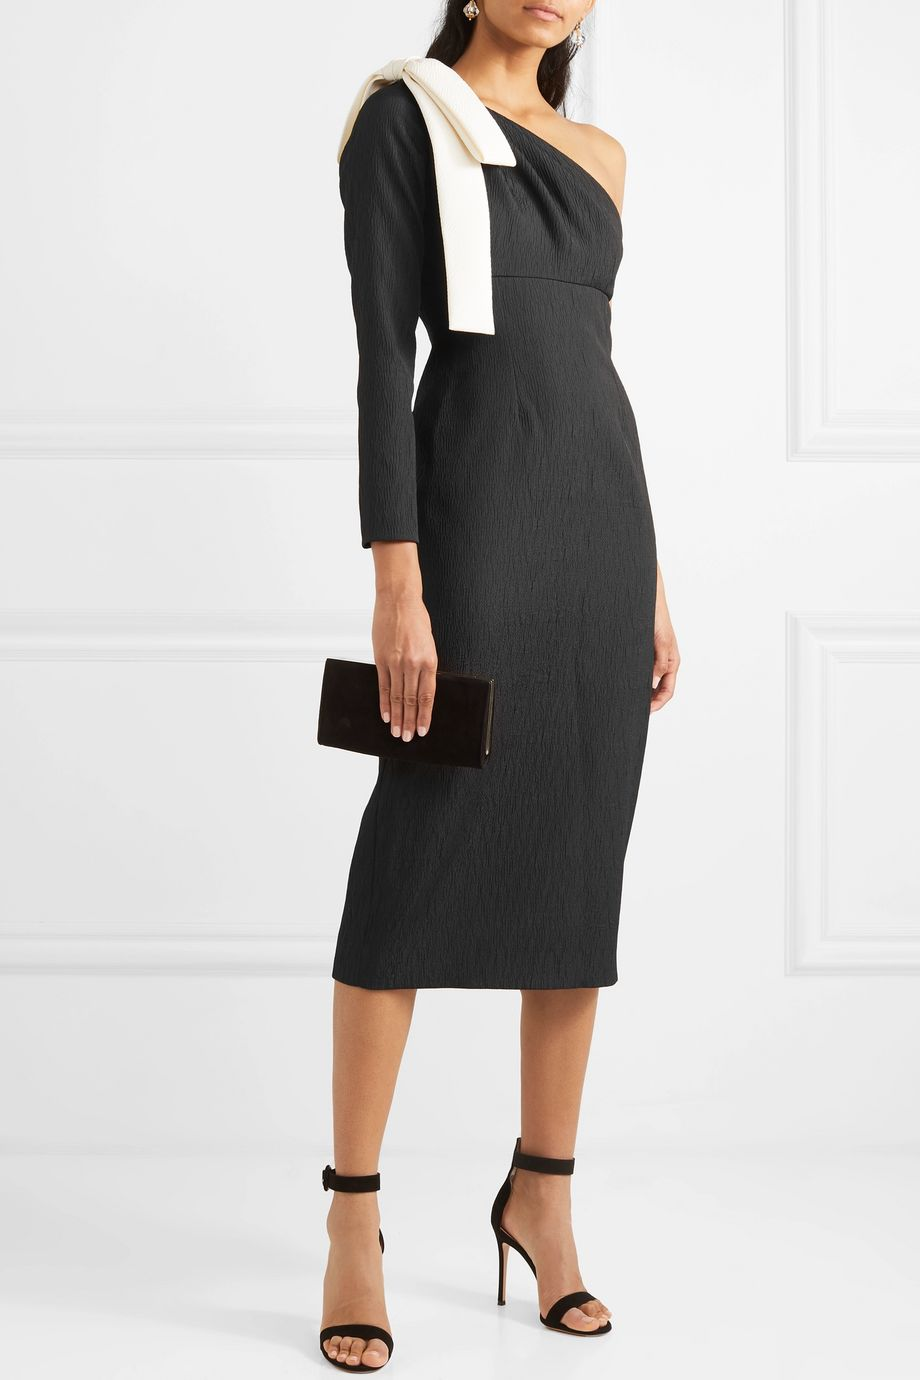 Emilia Wickstead Nadia one-sleeve bow-detailed cloqué dress